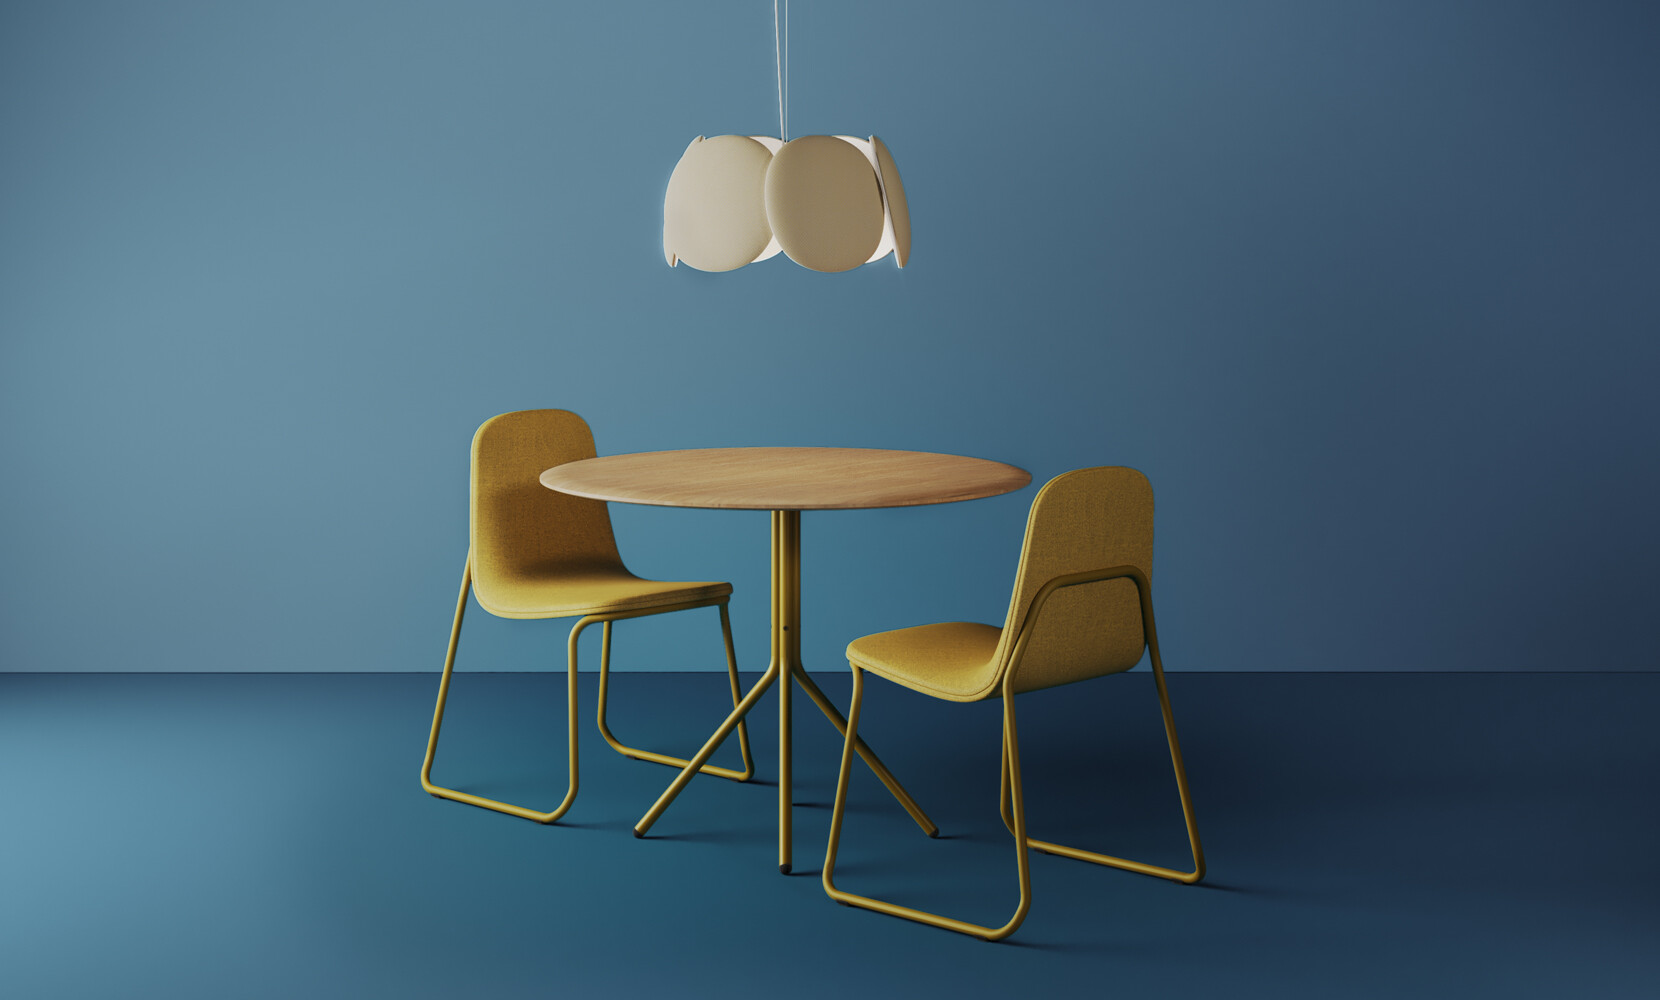 bogaerts_furniture_setting1